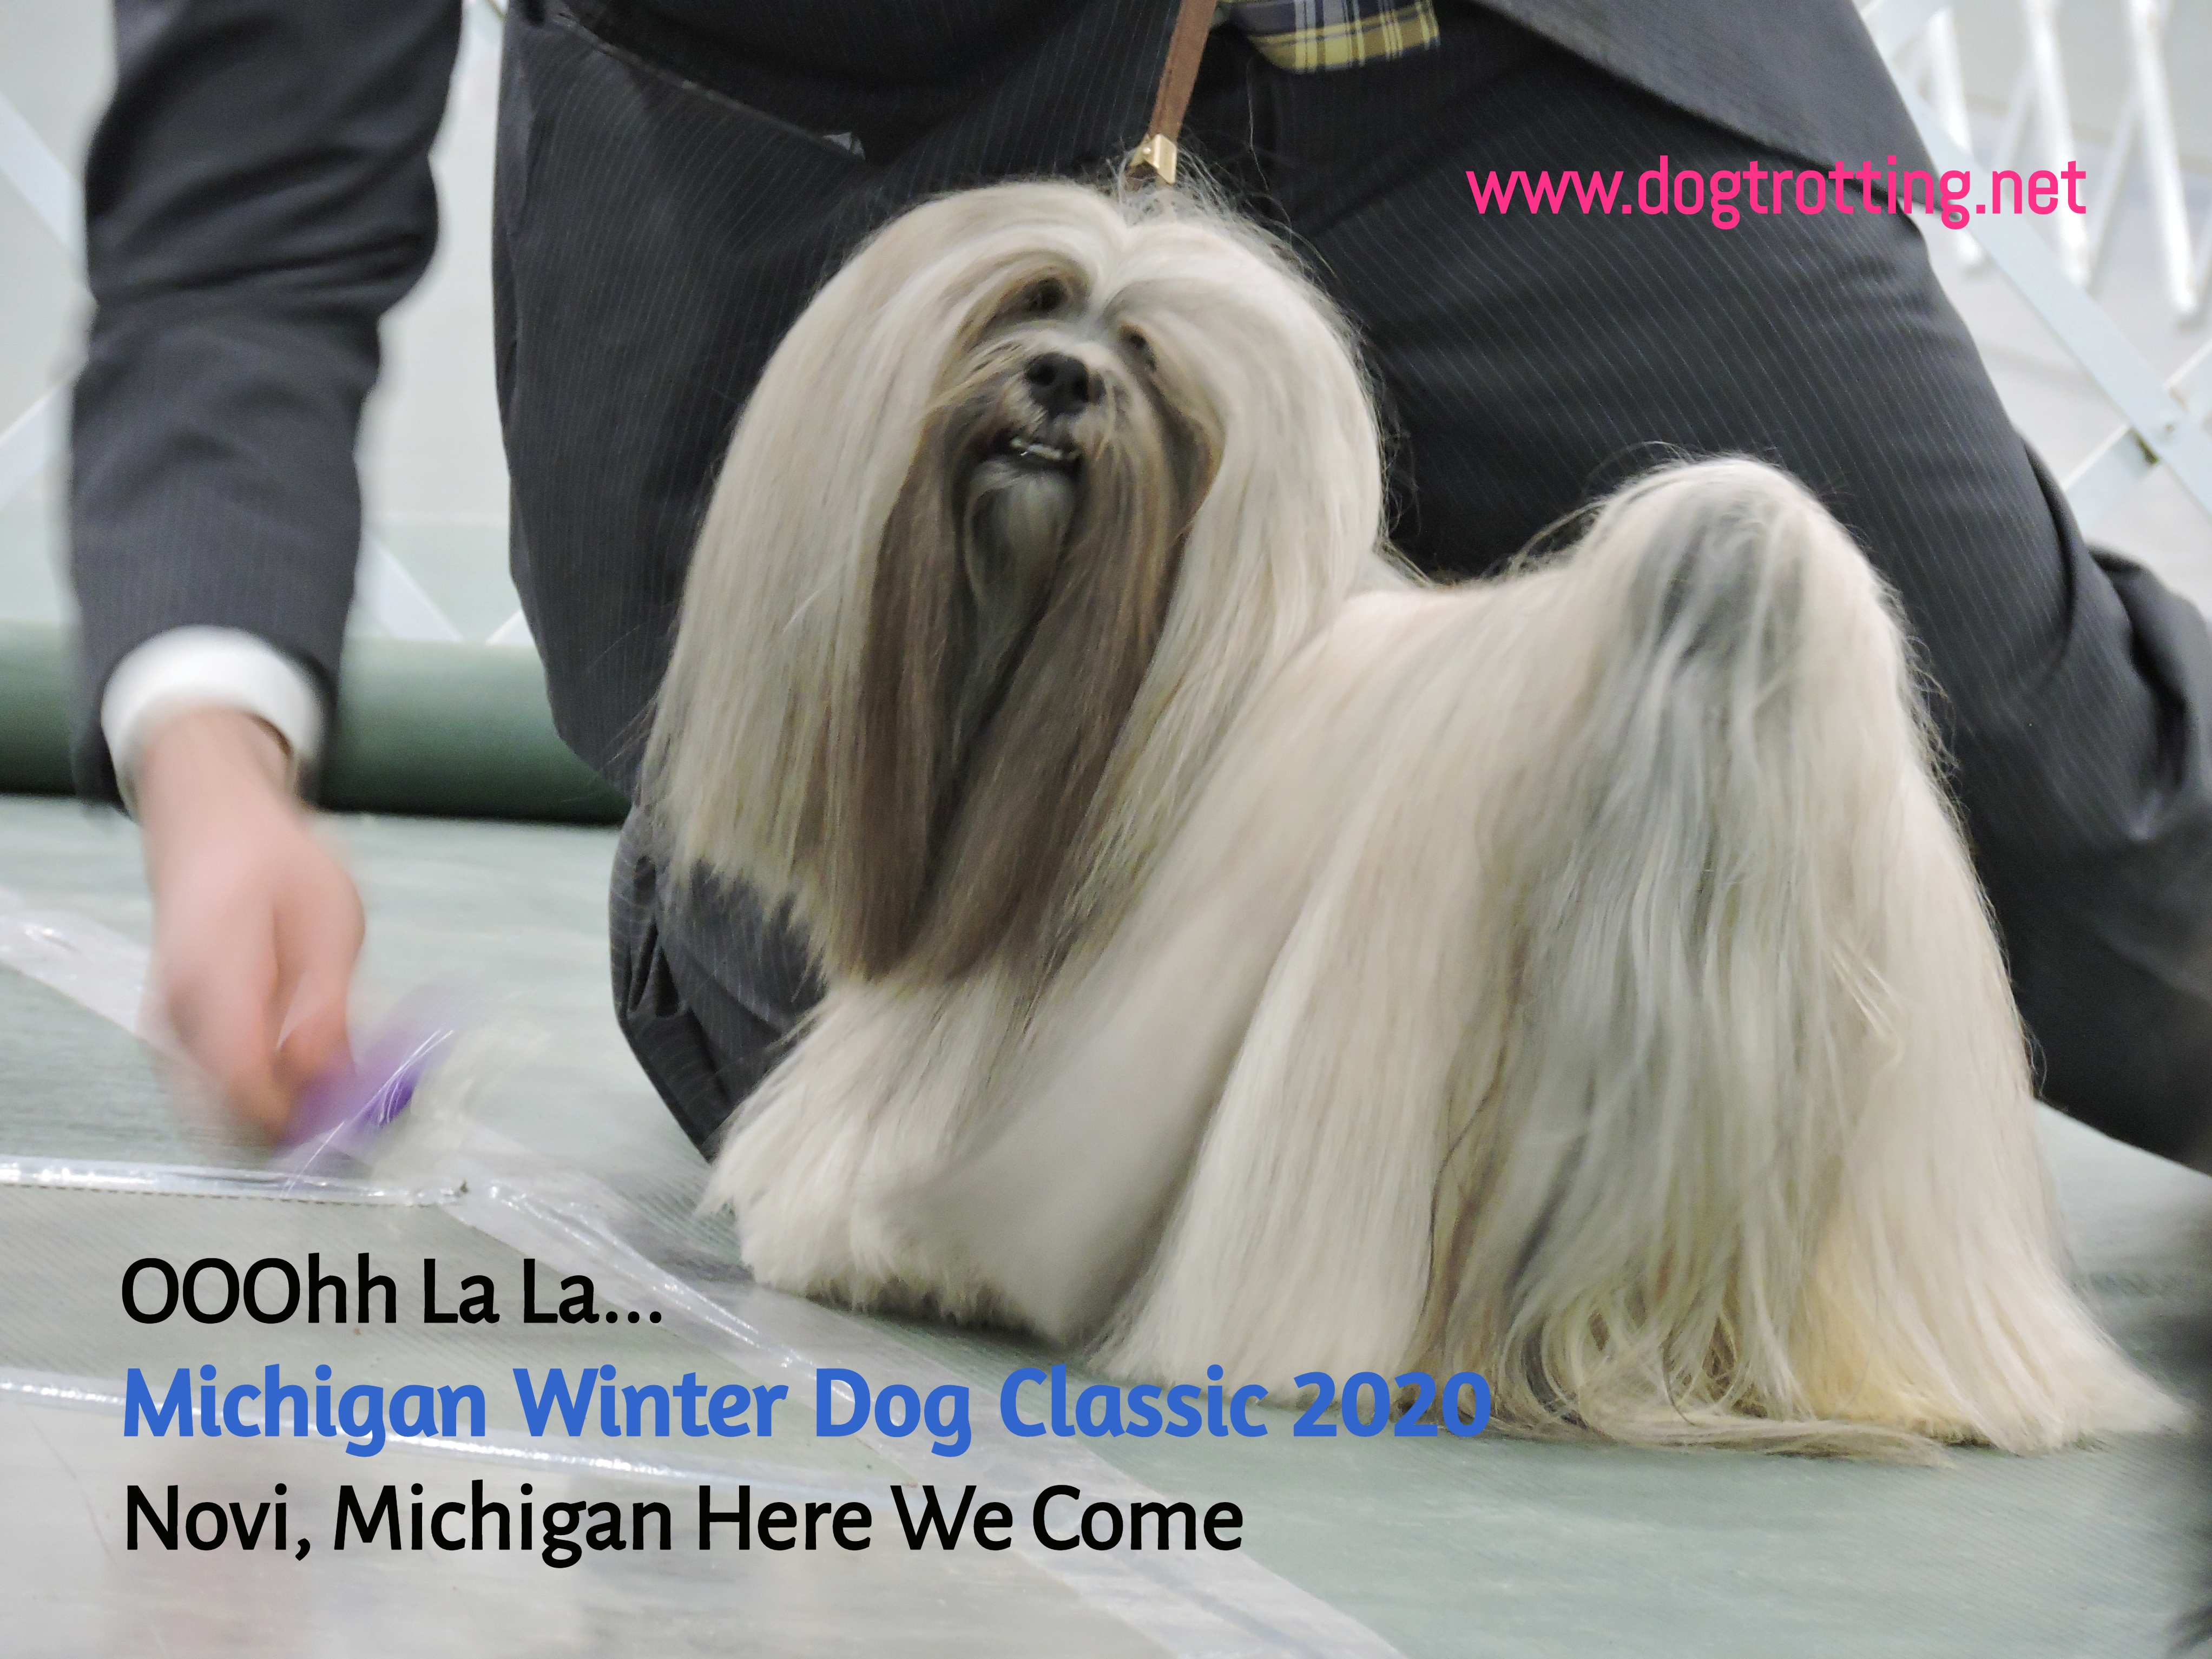 Peekineese dog at The Michigan Winter Dog Classic dog show